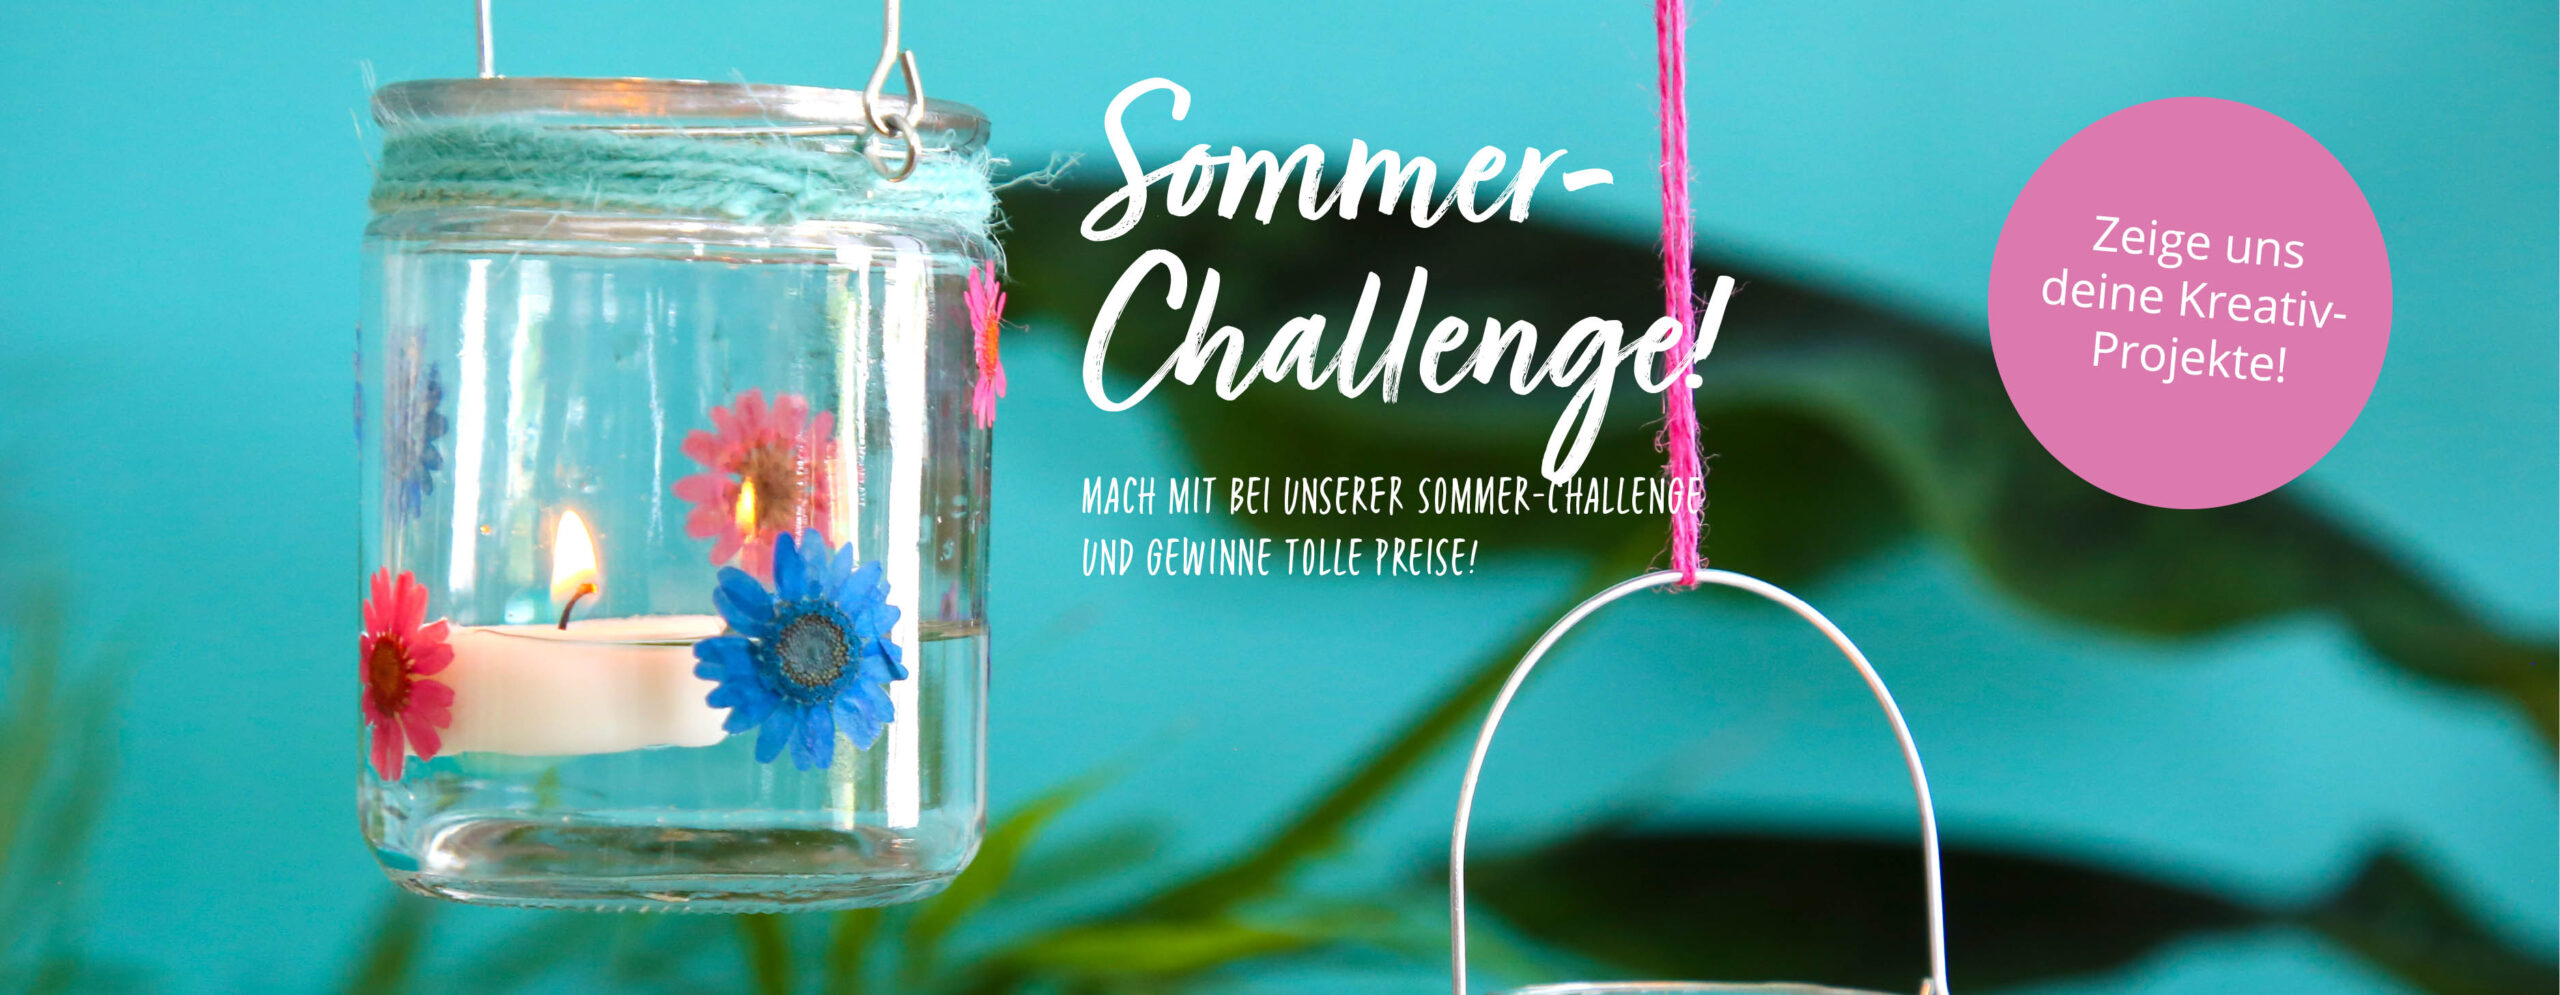 Slider_1800x700(150dpi)Challenge